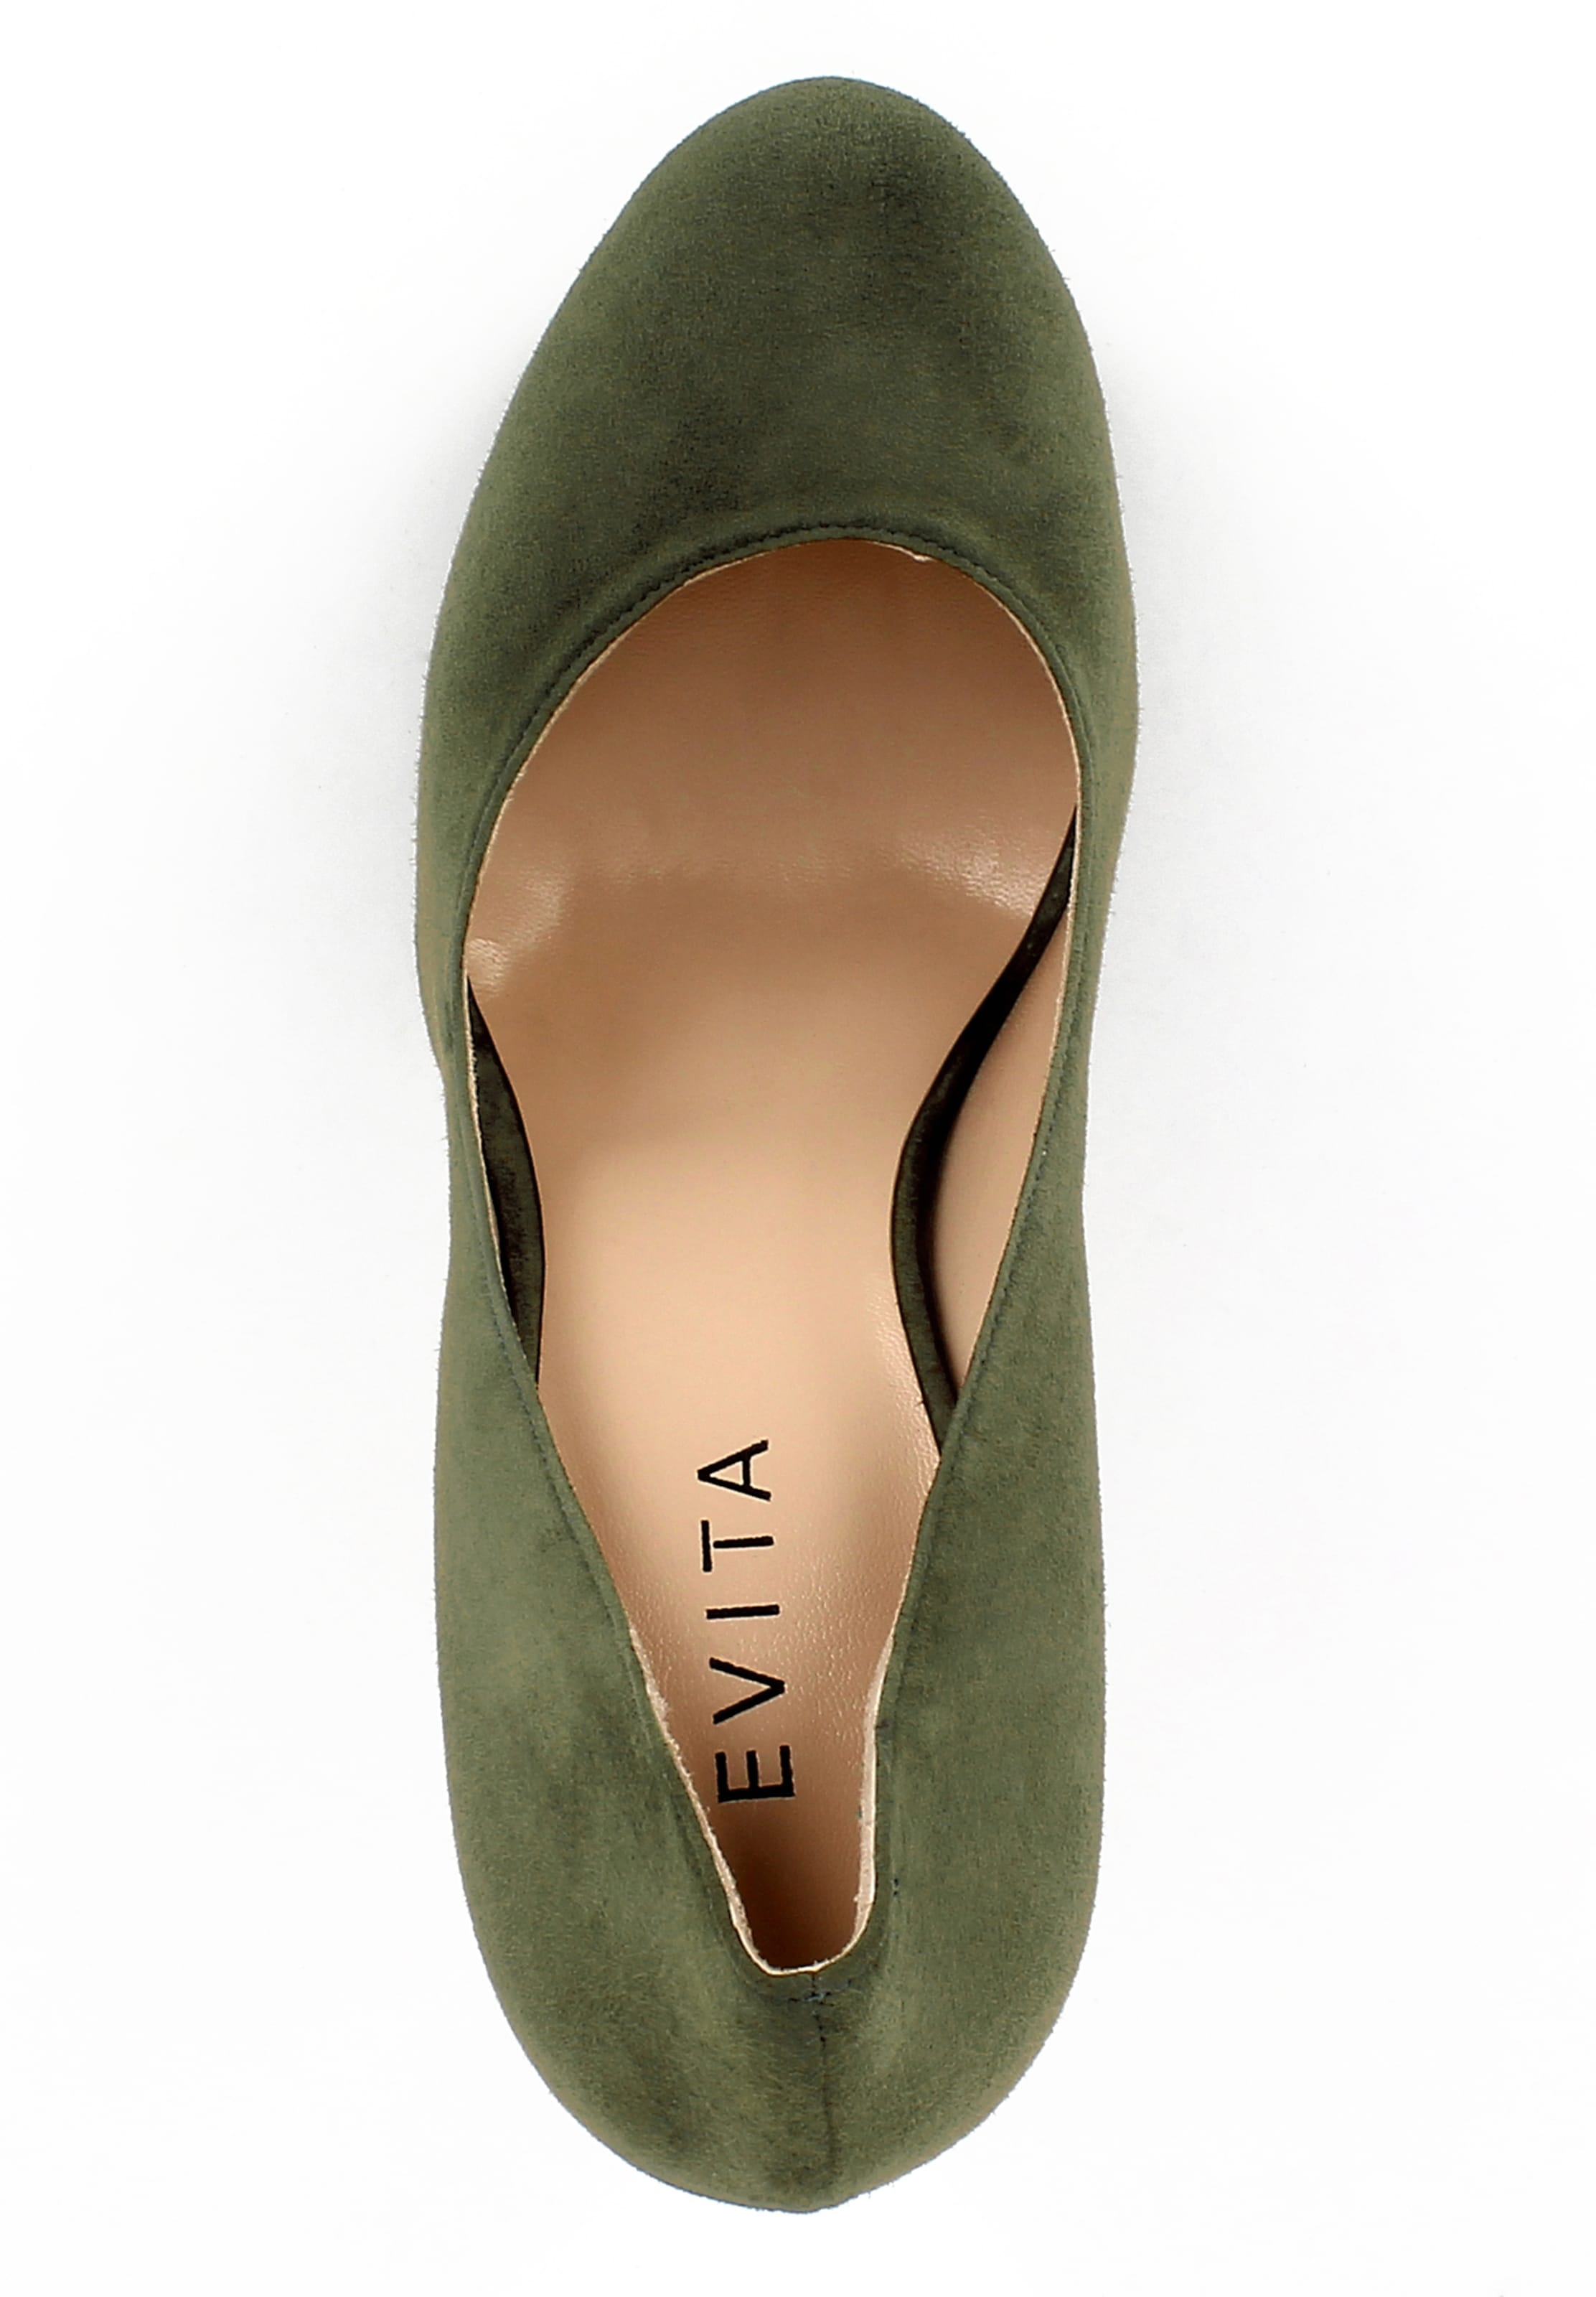 Olive Evita 'riccarda' Escarpins En Evita 'riccarda' Escarpins En Olive kXPiZu